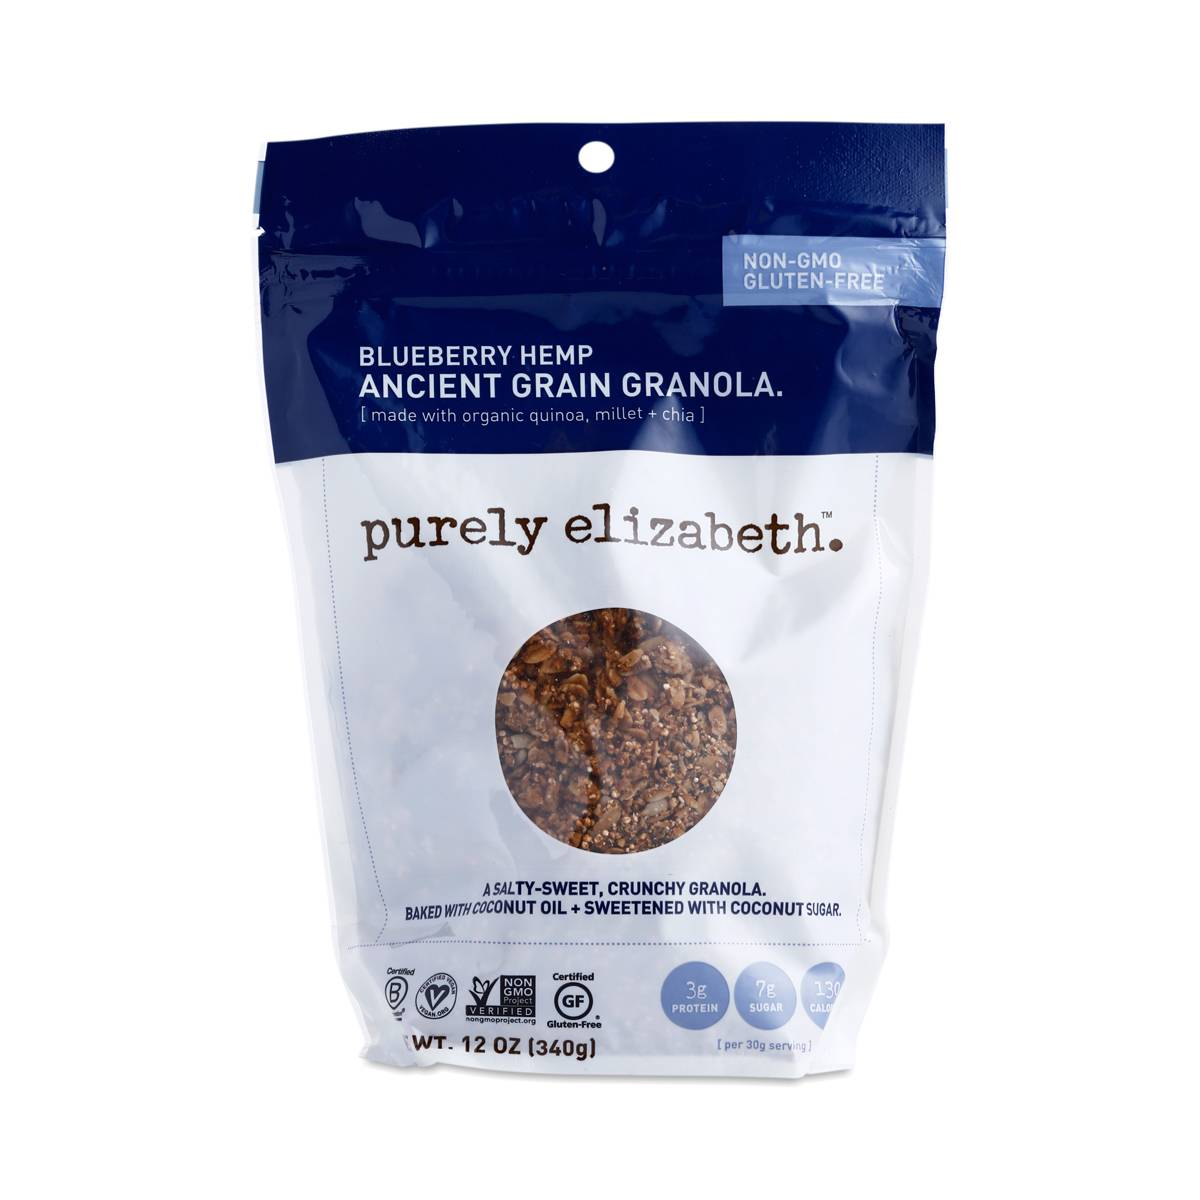 Purely Elizabeth Ancient Grain Granola Cereal Blueberry